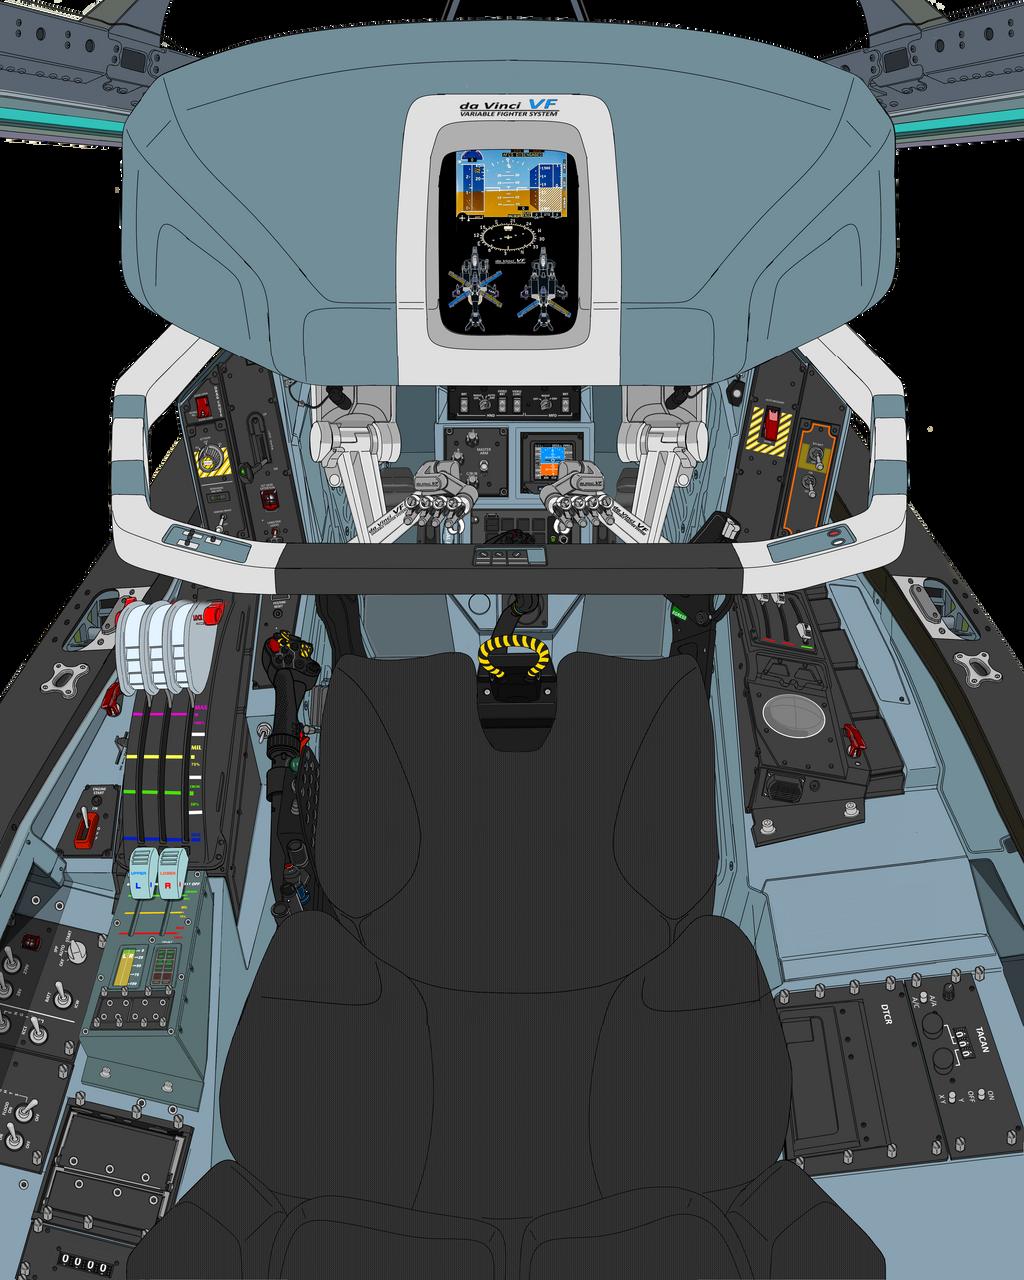 (Drogue parachute update) Block 50 cockpit-A